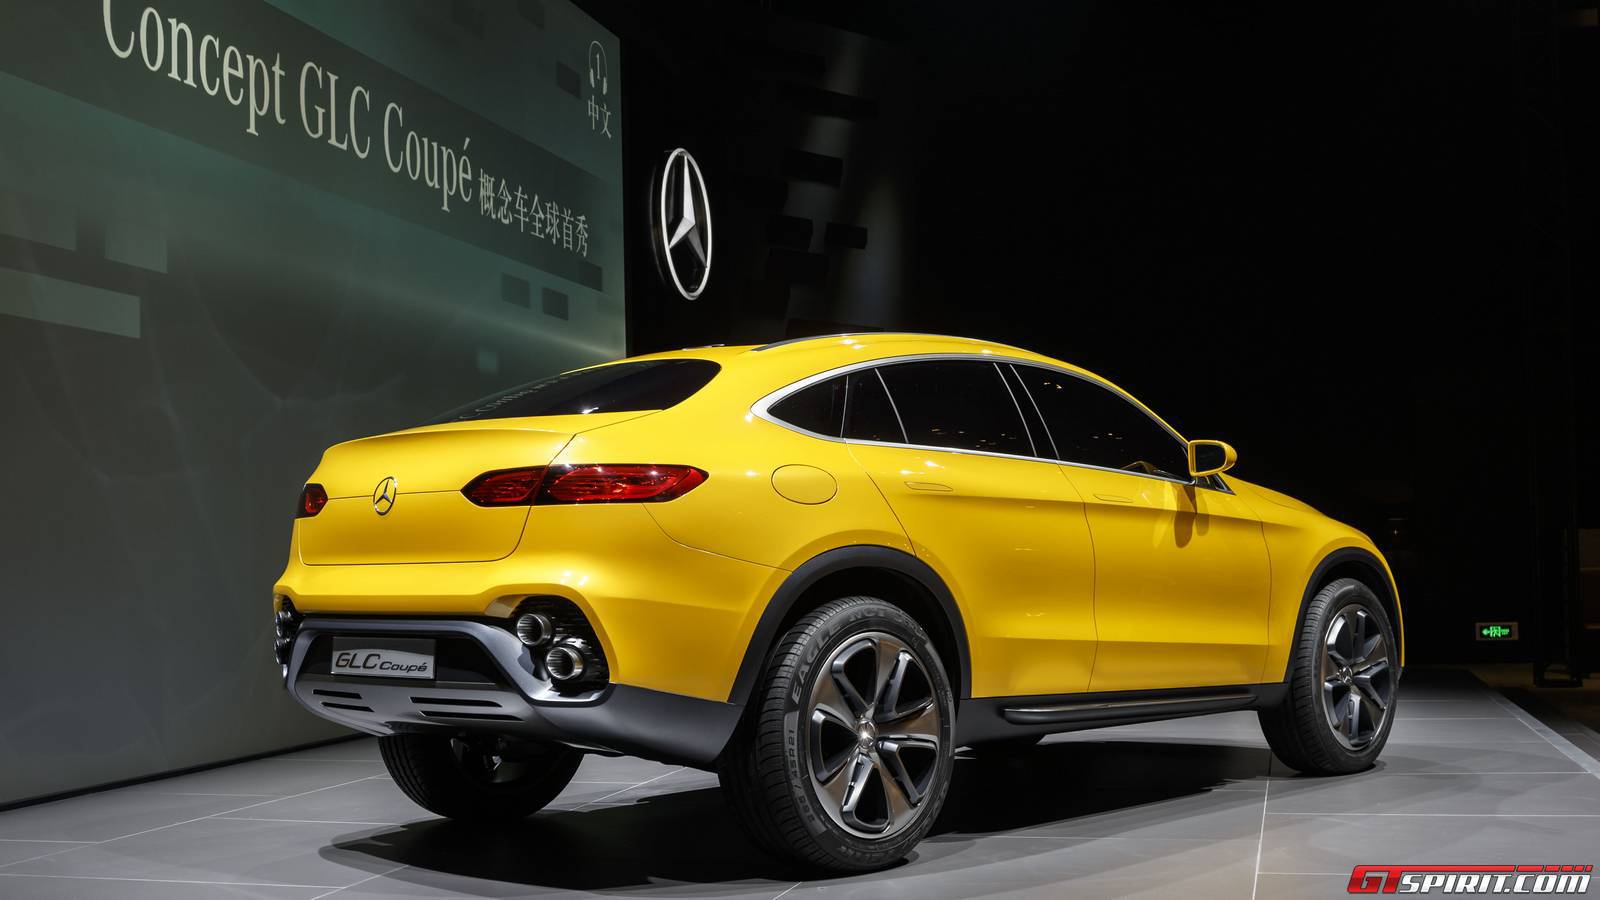 Mercedes benz glc hydrogen fcv to launch next year gtspirit for Mercedes benz concept coupe